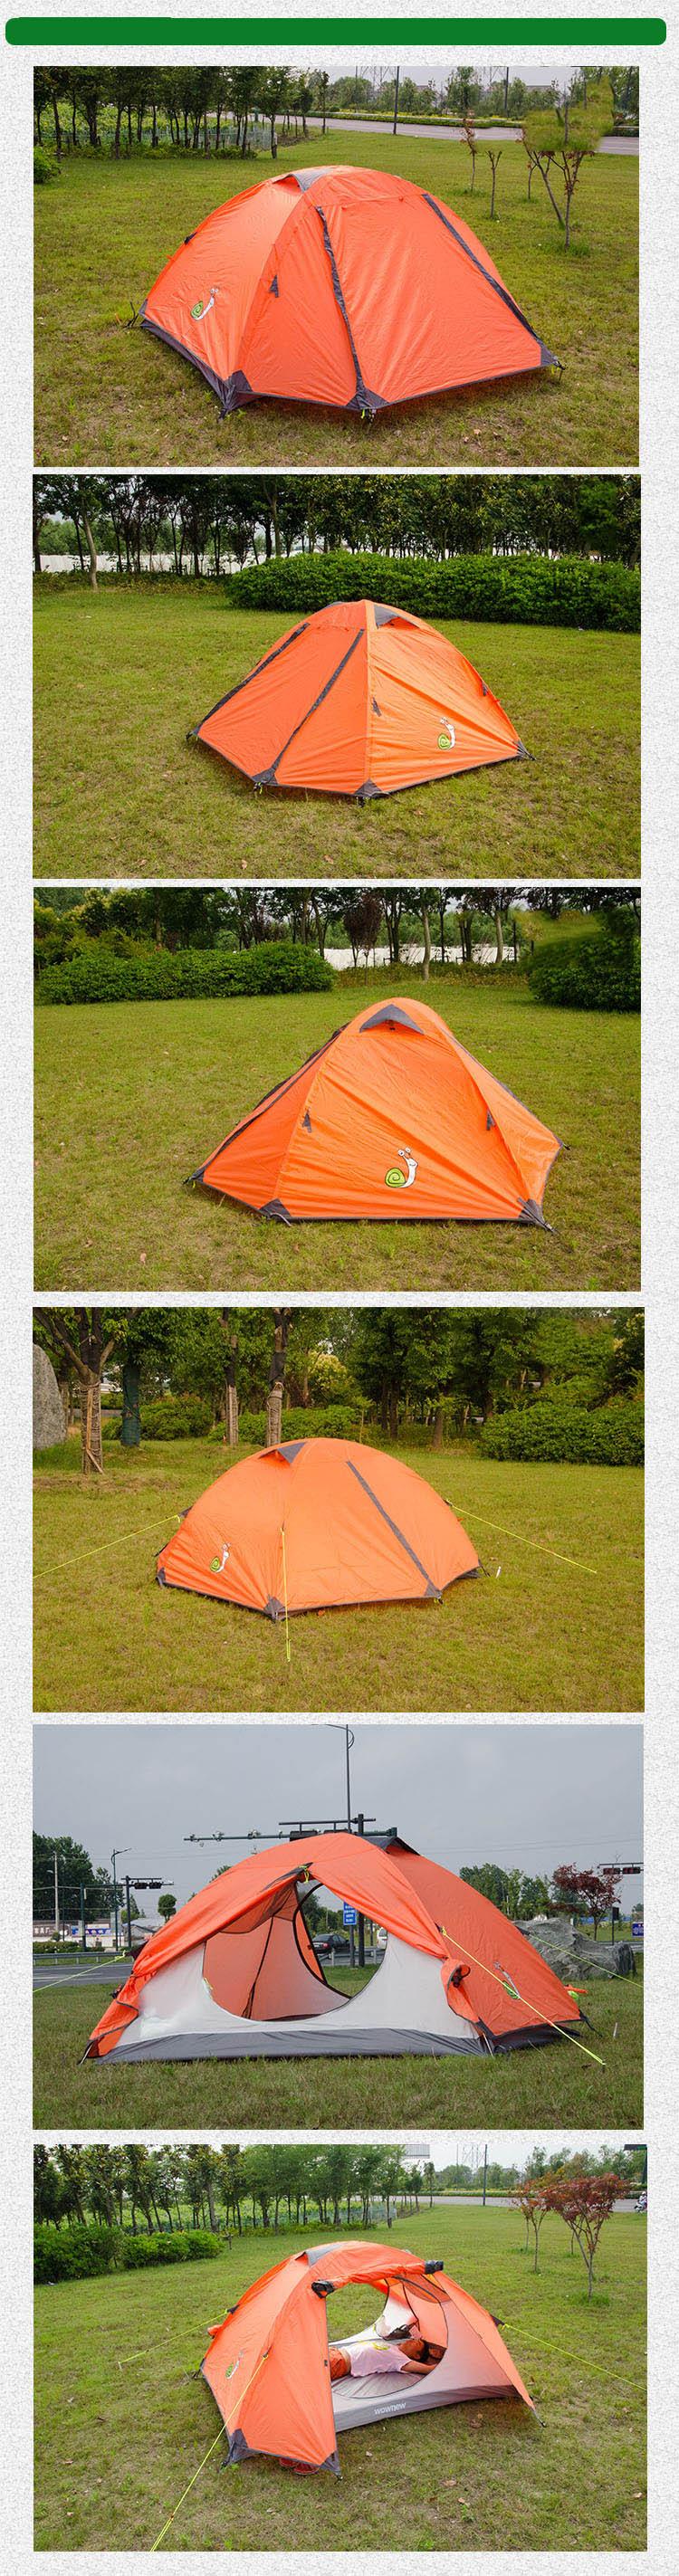 New Camping Tent Aluminum Rod 4 Person Tent Easy Setup ...